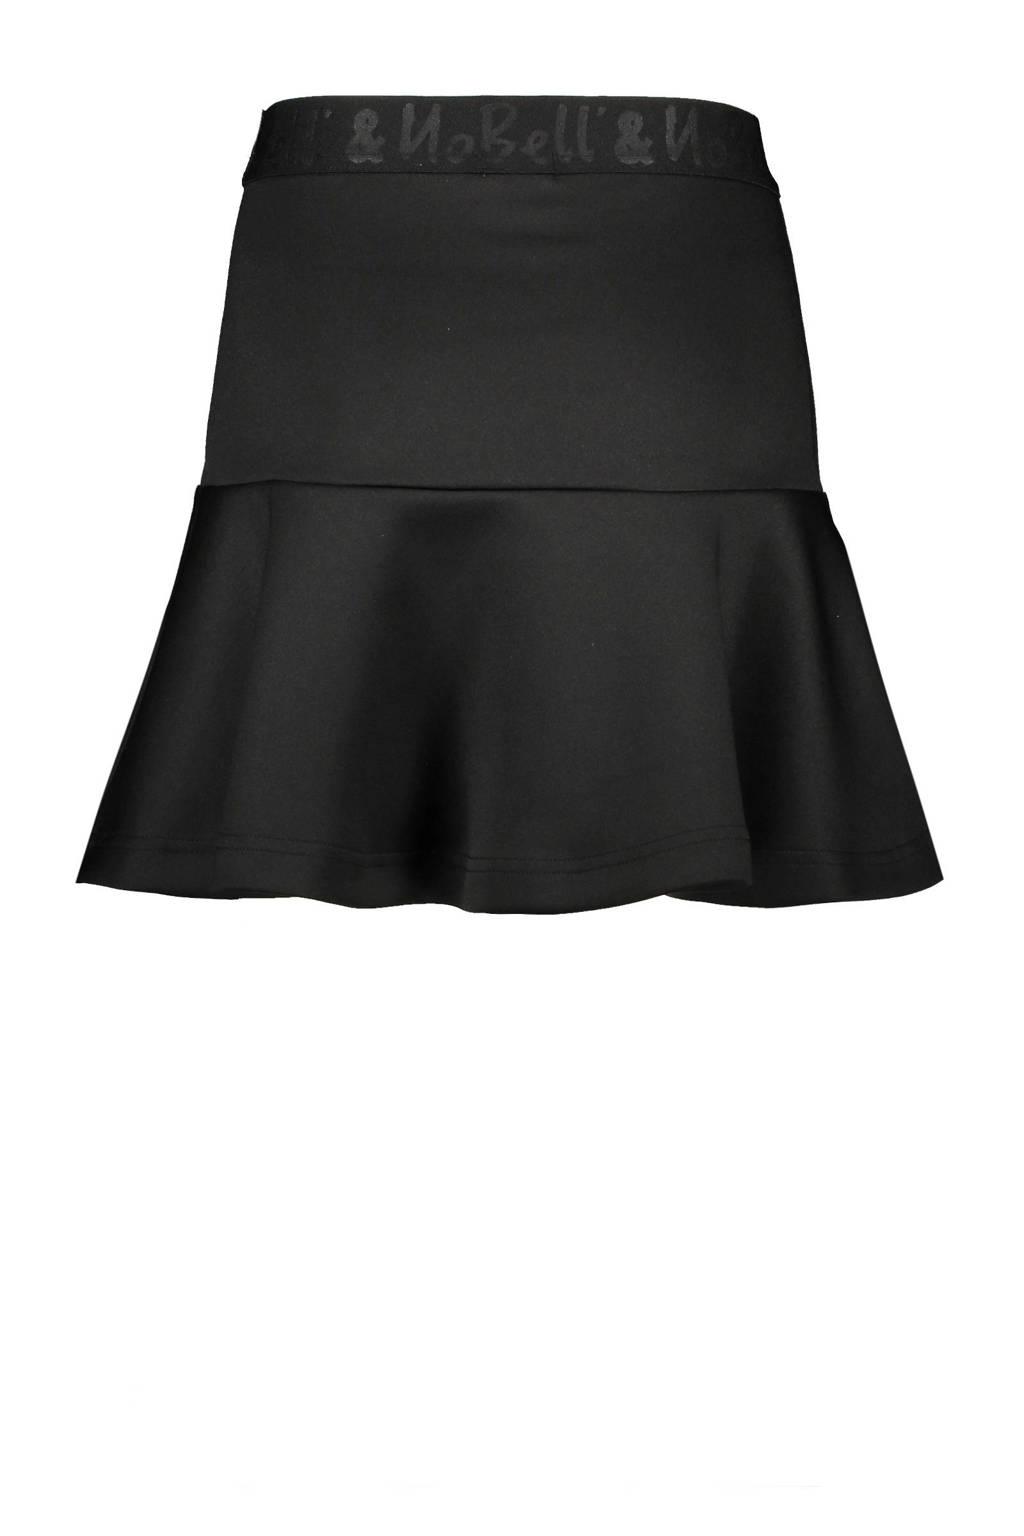 NoBell' rok Nina zwart, Zwart